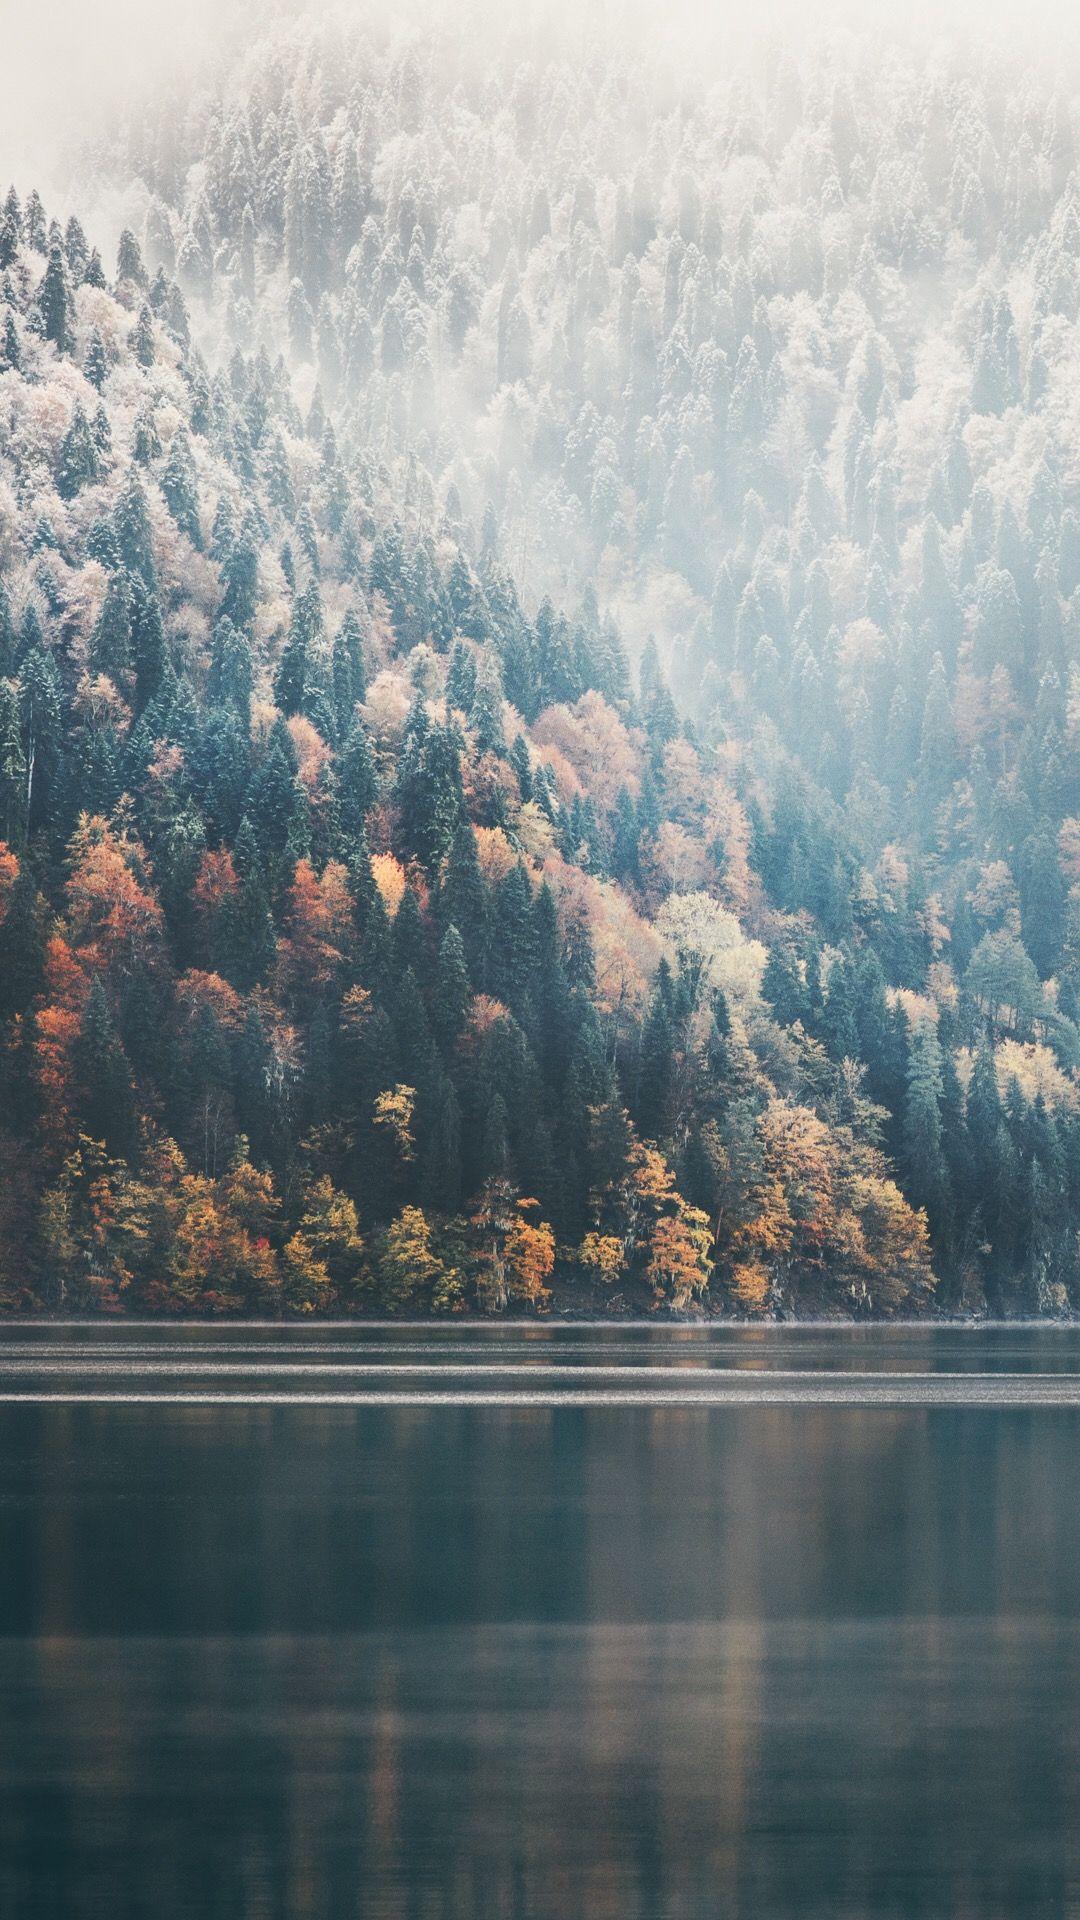 Fog Wallpaper Forest Wallpaper Iphone Forest Wallpaper Aesthetic Wallpapers